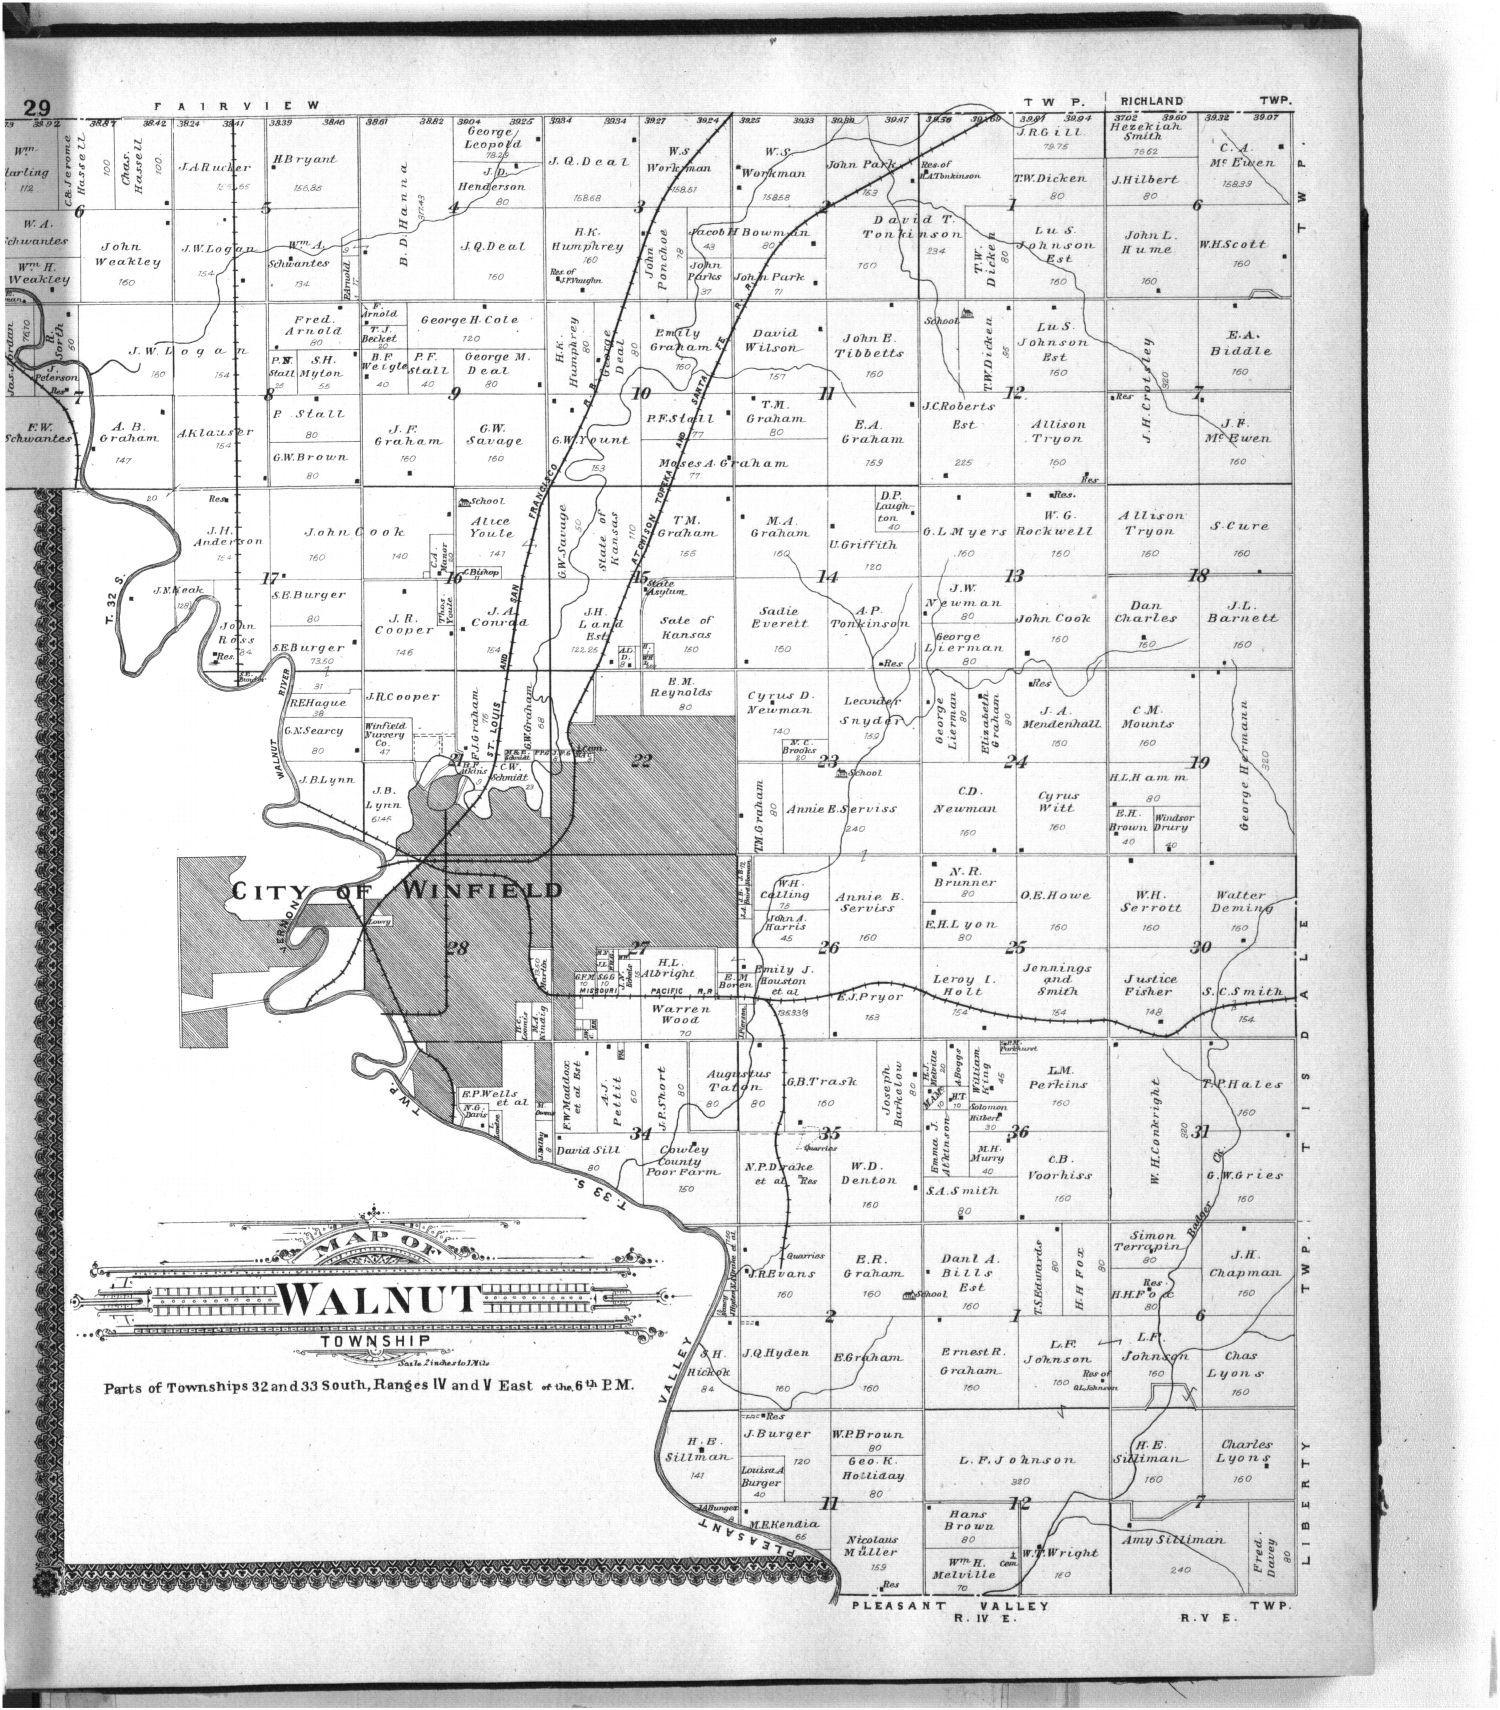 Standard atlas of Cowley County, Kansas - 29